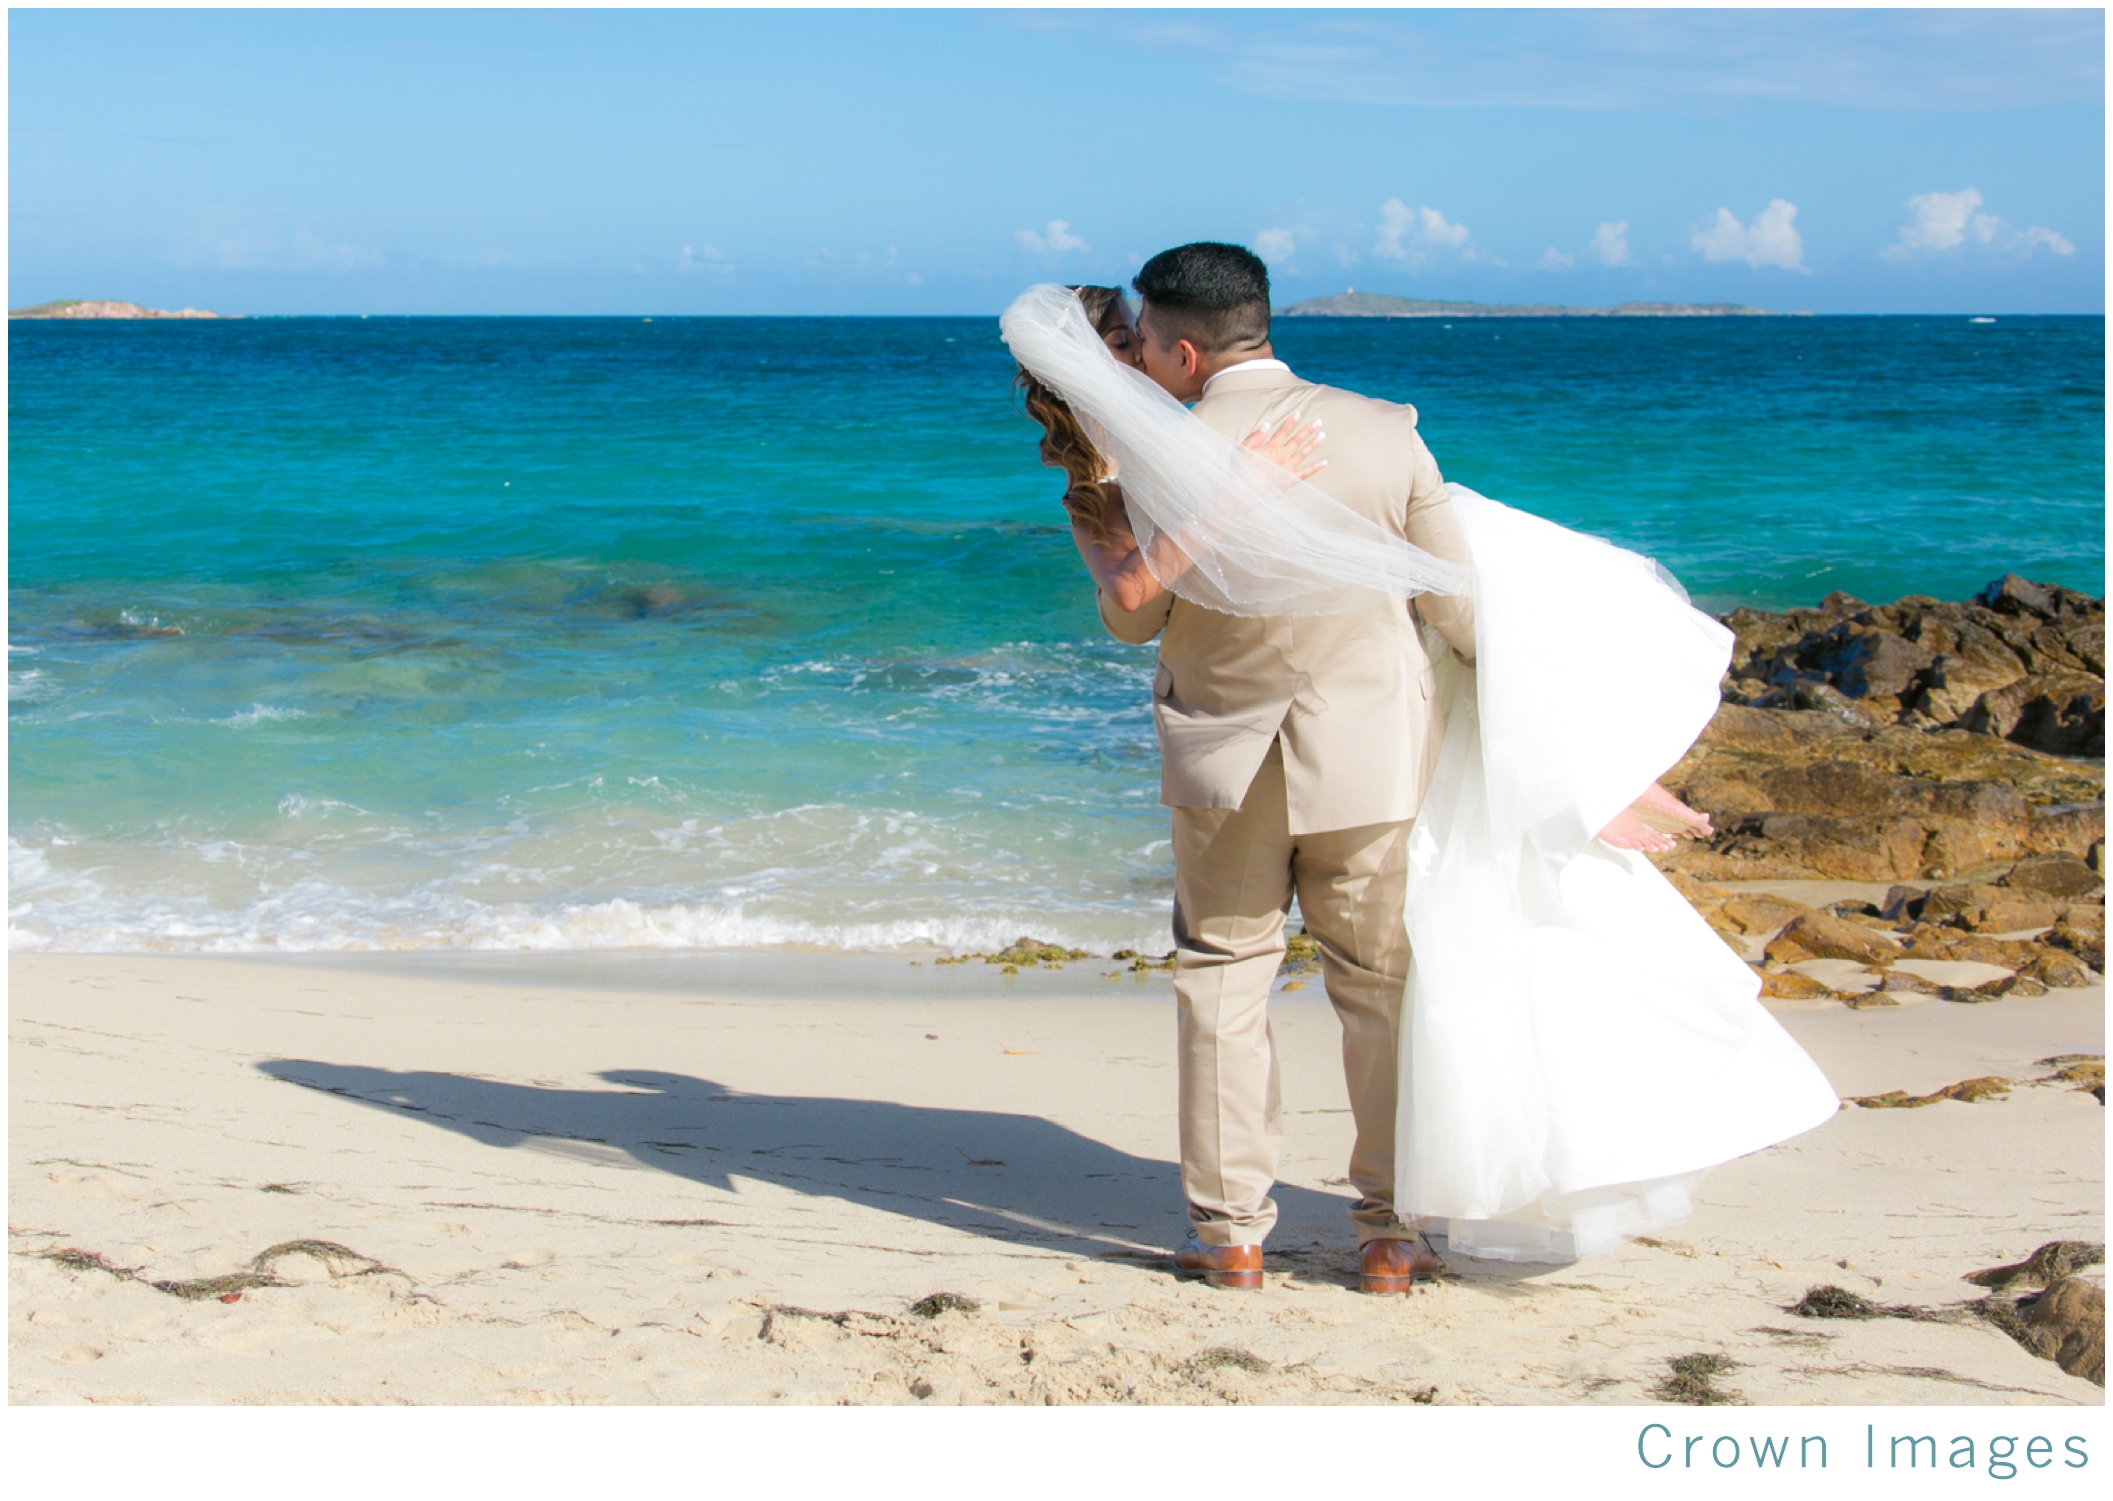 wedding-photos-st-thomas-marriott-frenchmans-reef_1822.jpg